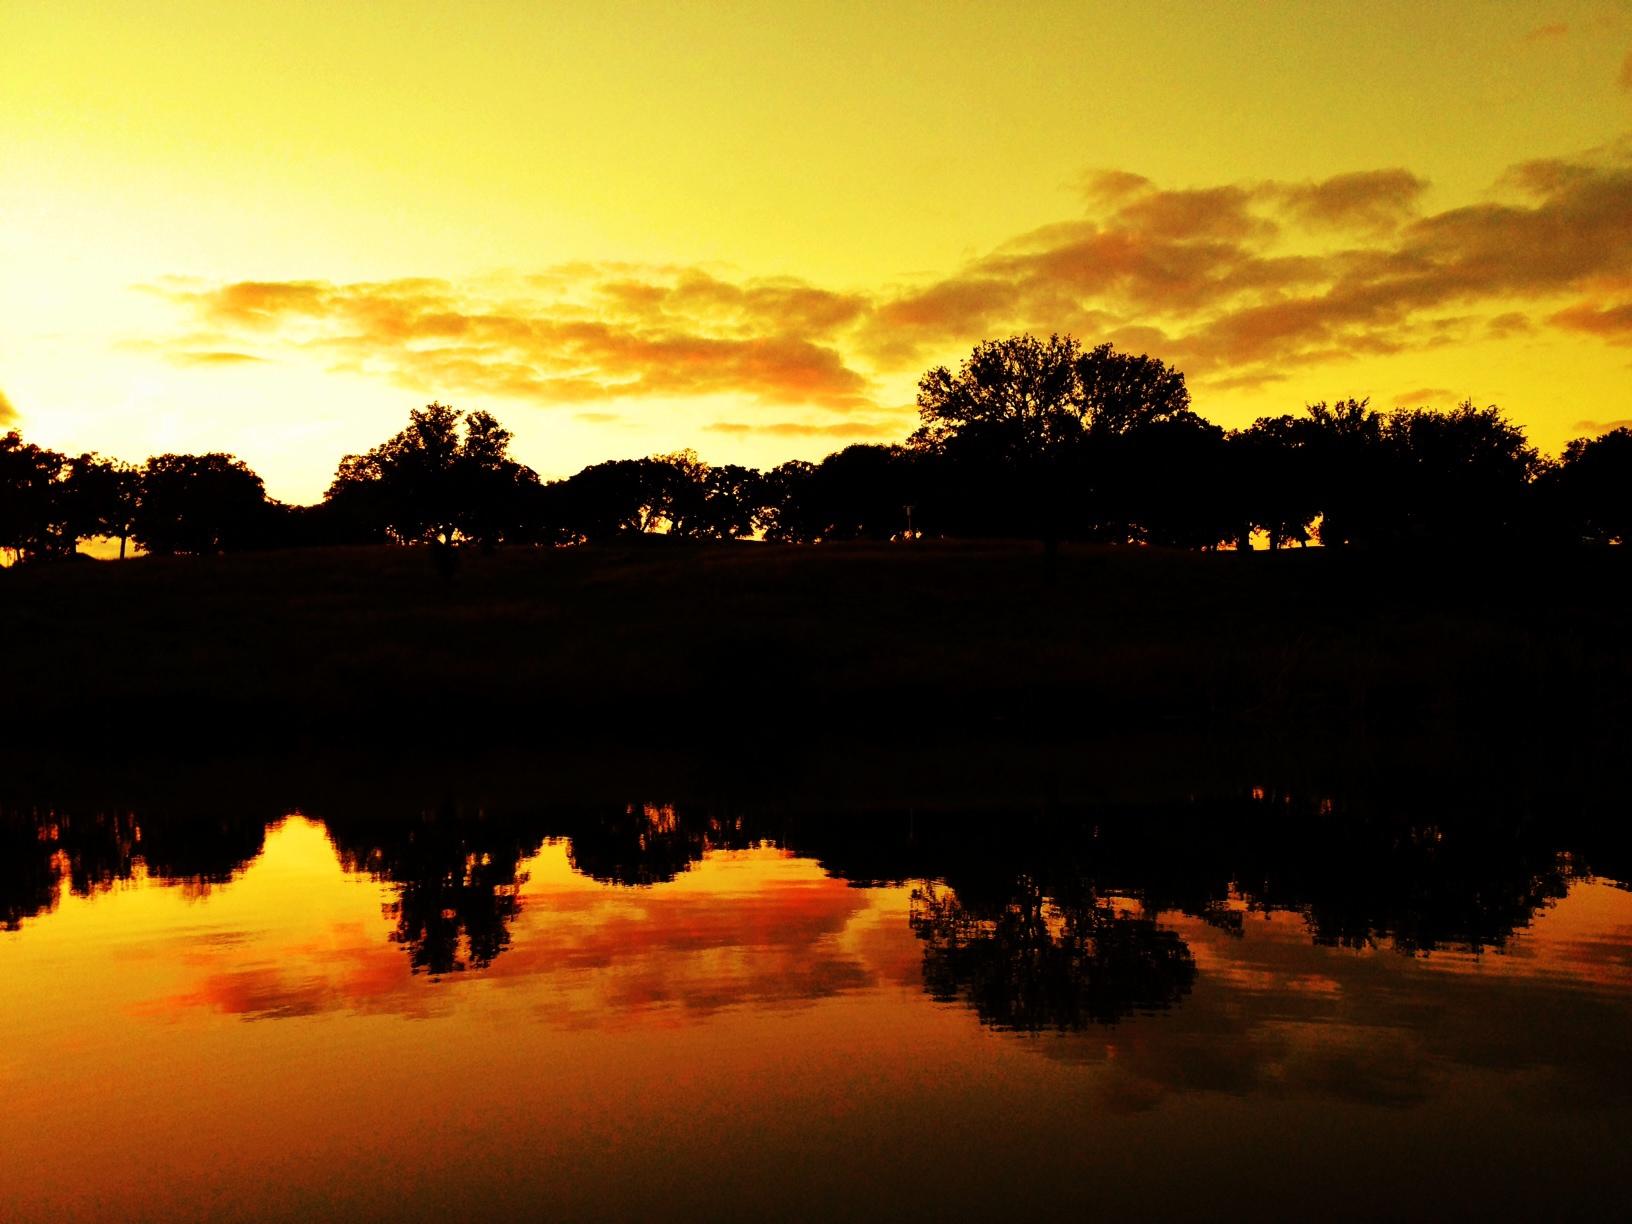 iPhone-Fredericksburg-sunset-golden.JPG